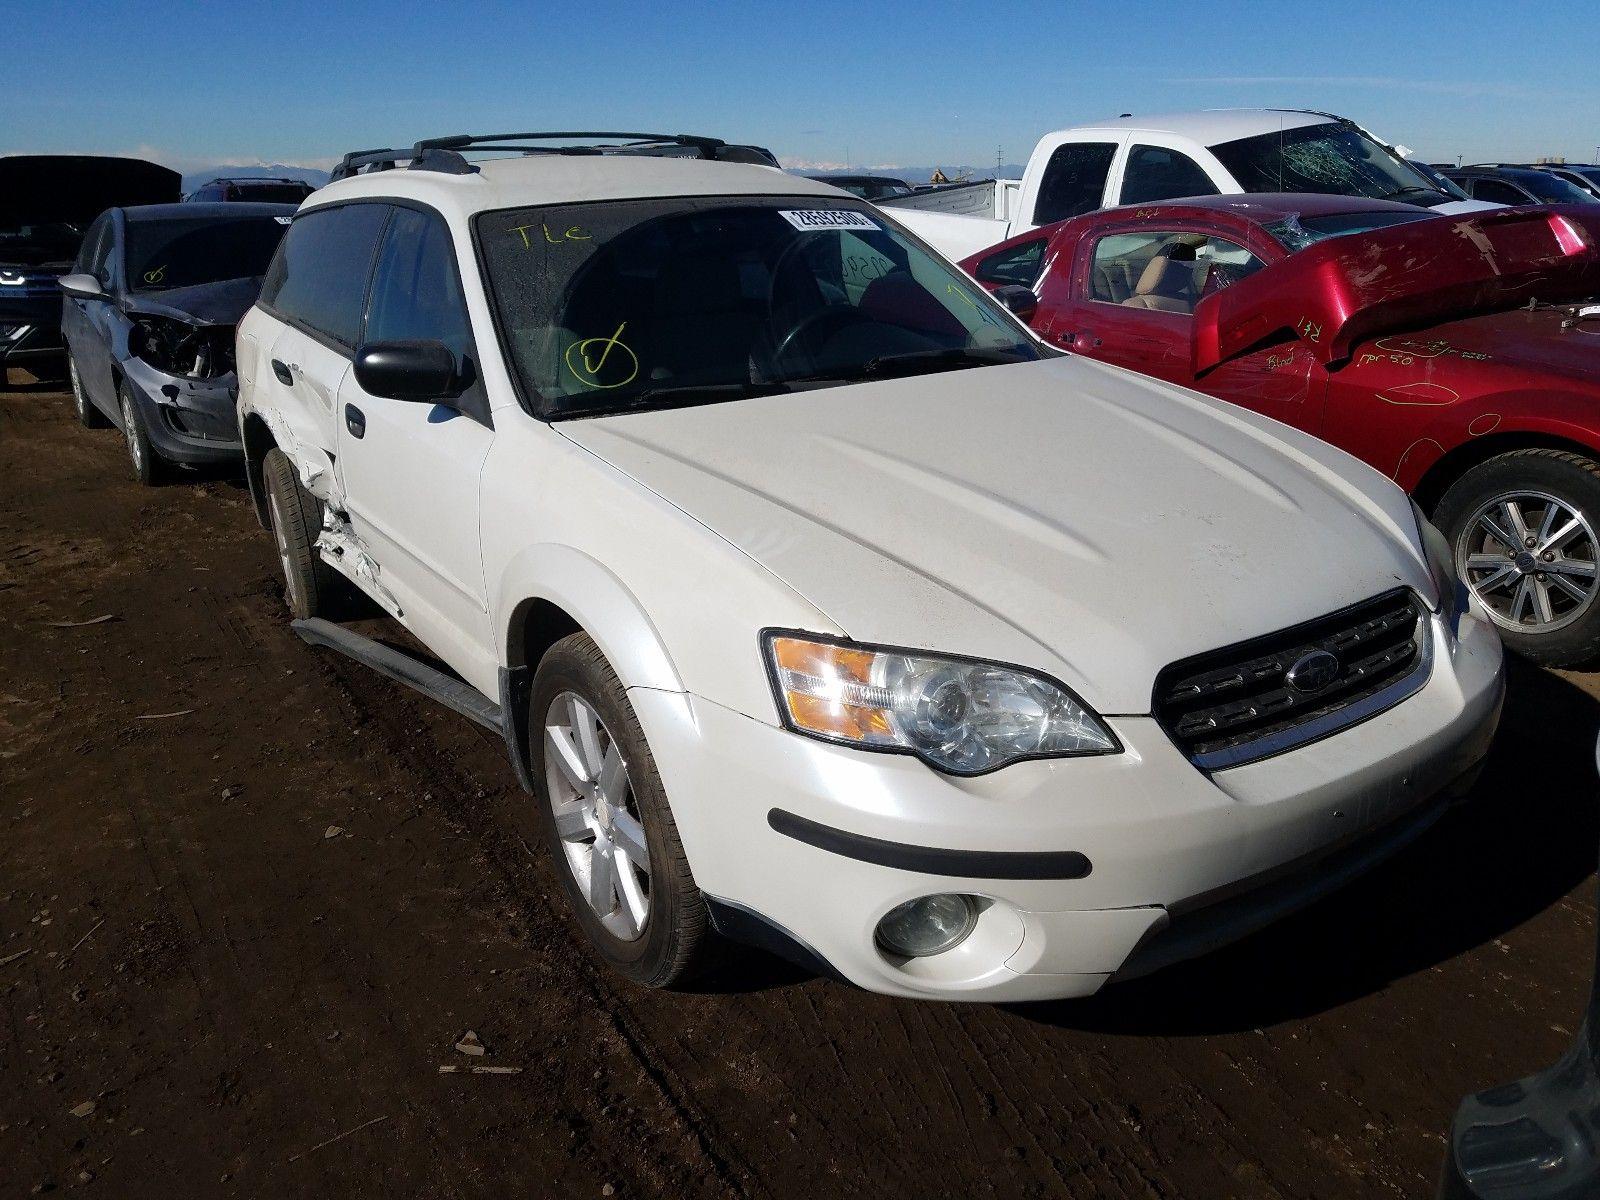 2006 Subaru Legacy Out 2 5l 4 Subaru Legacy Subaru Car Auctions